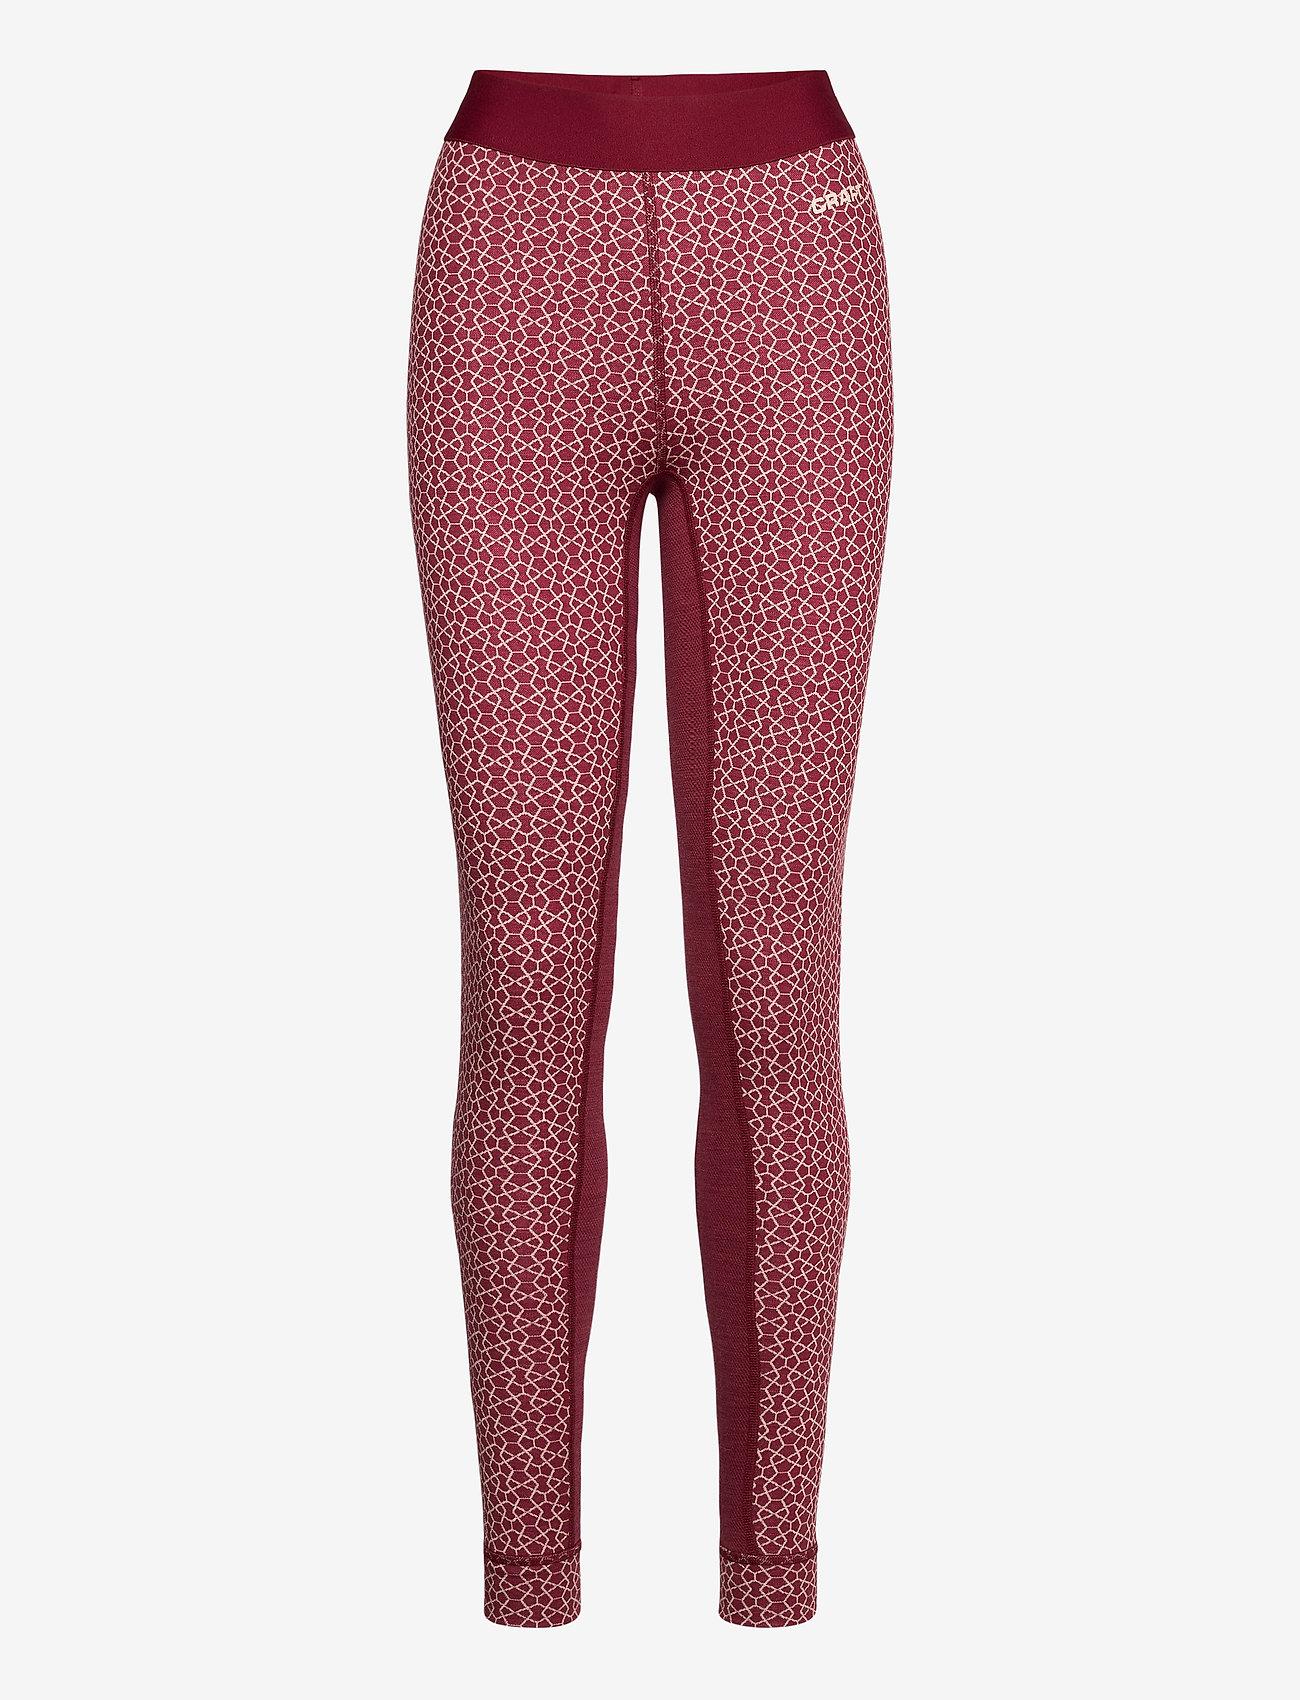 Craft - MERINO 240 PANTS W - nederdelar - rhubarg/touch - 0